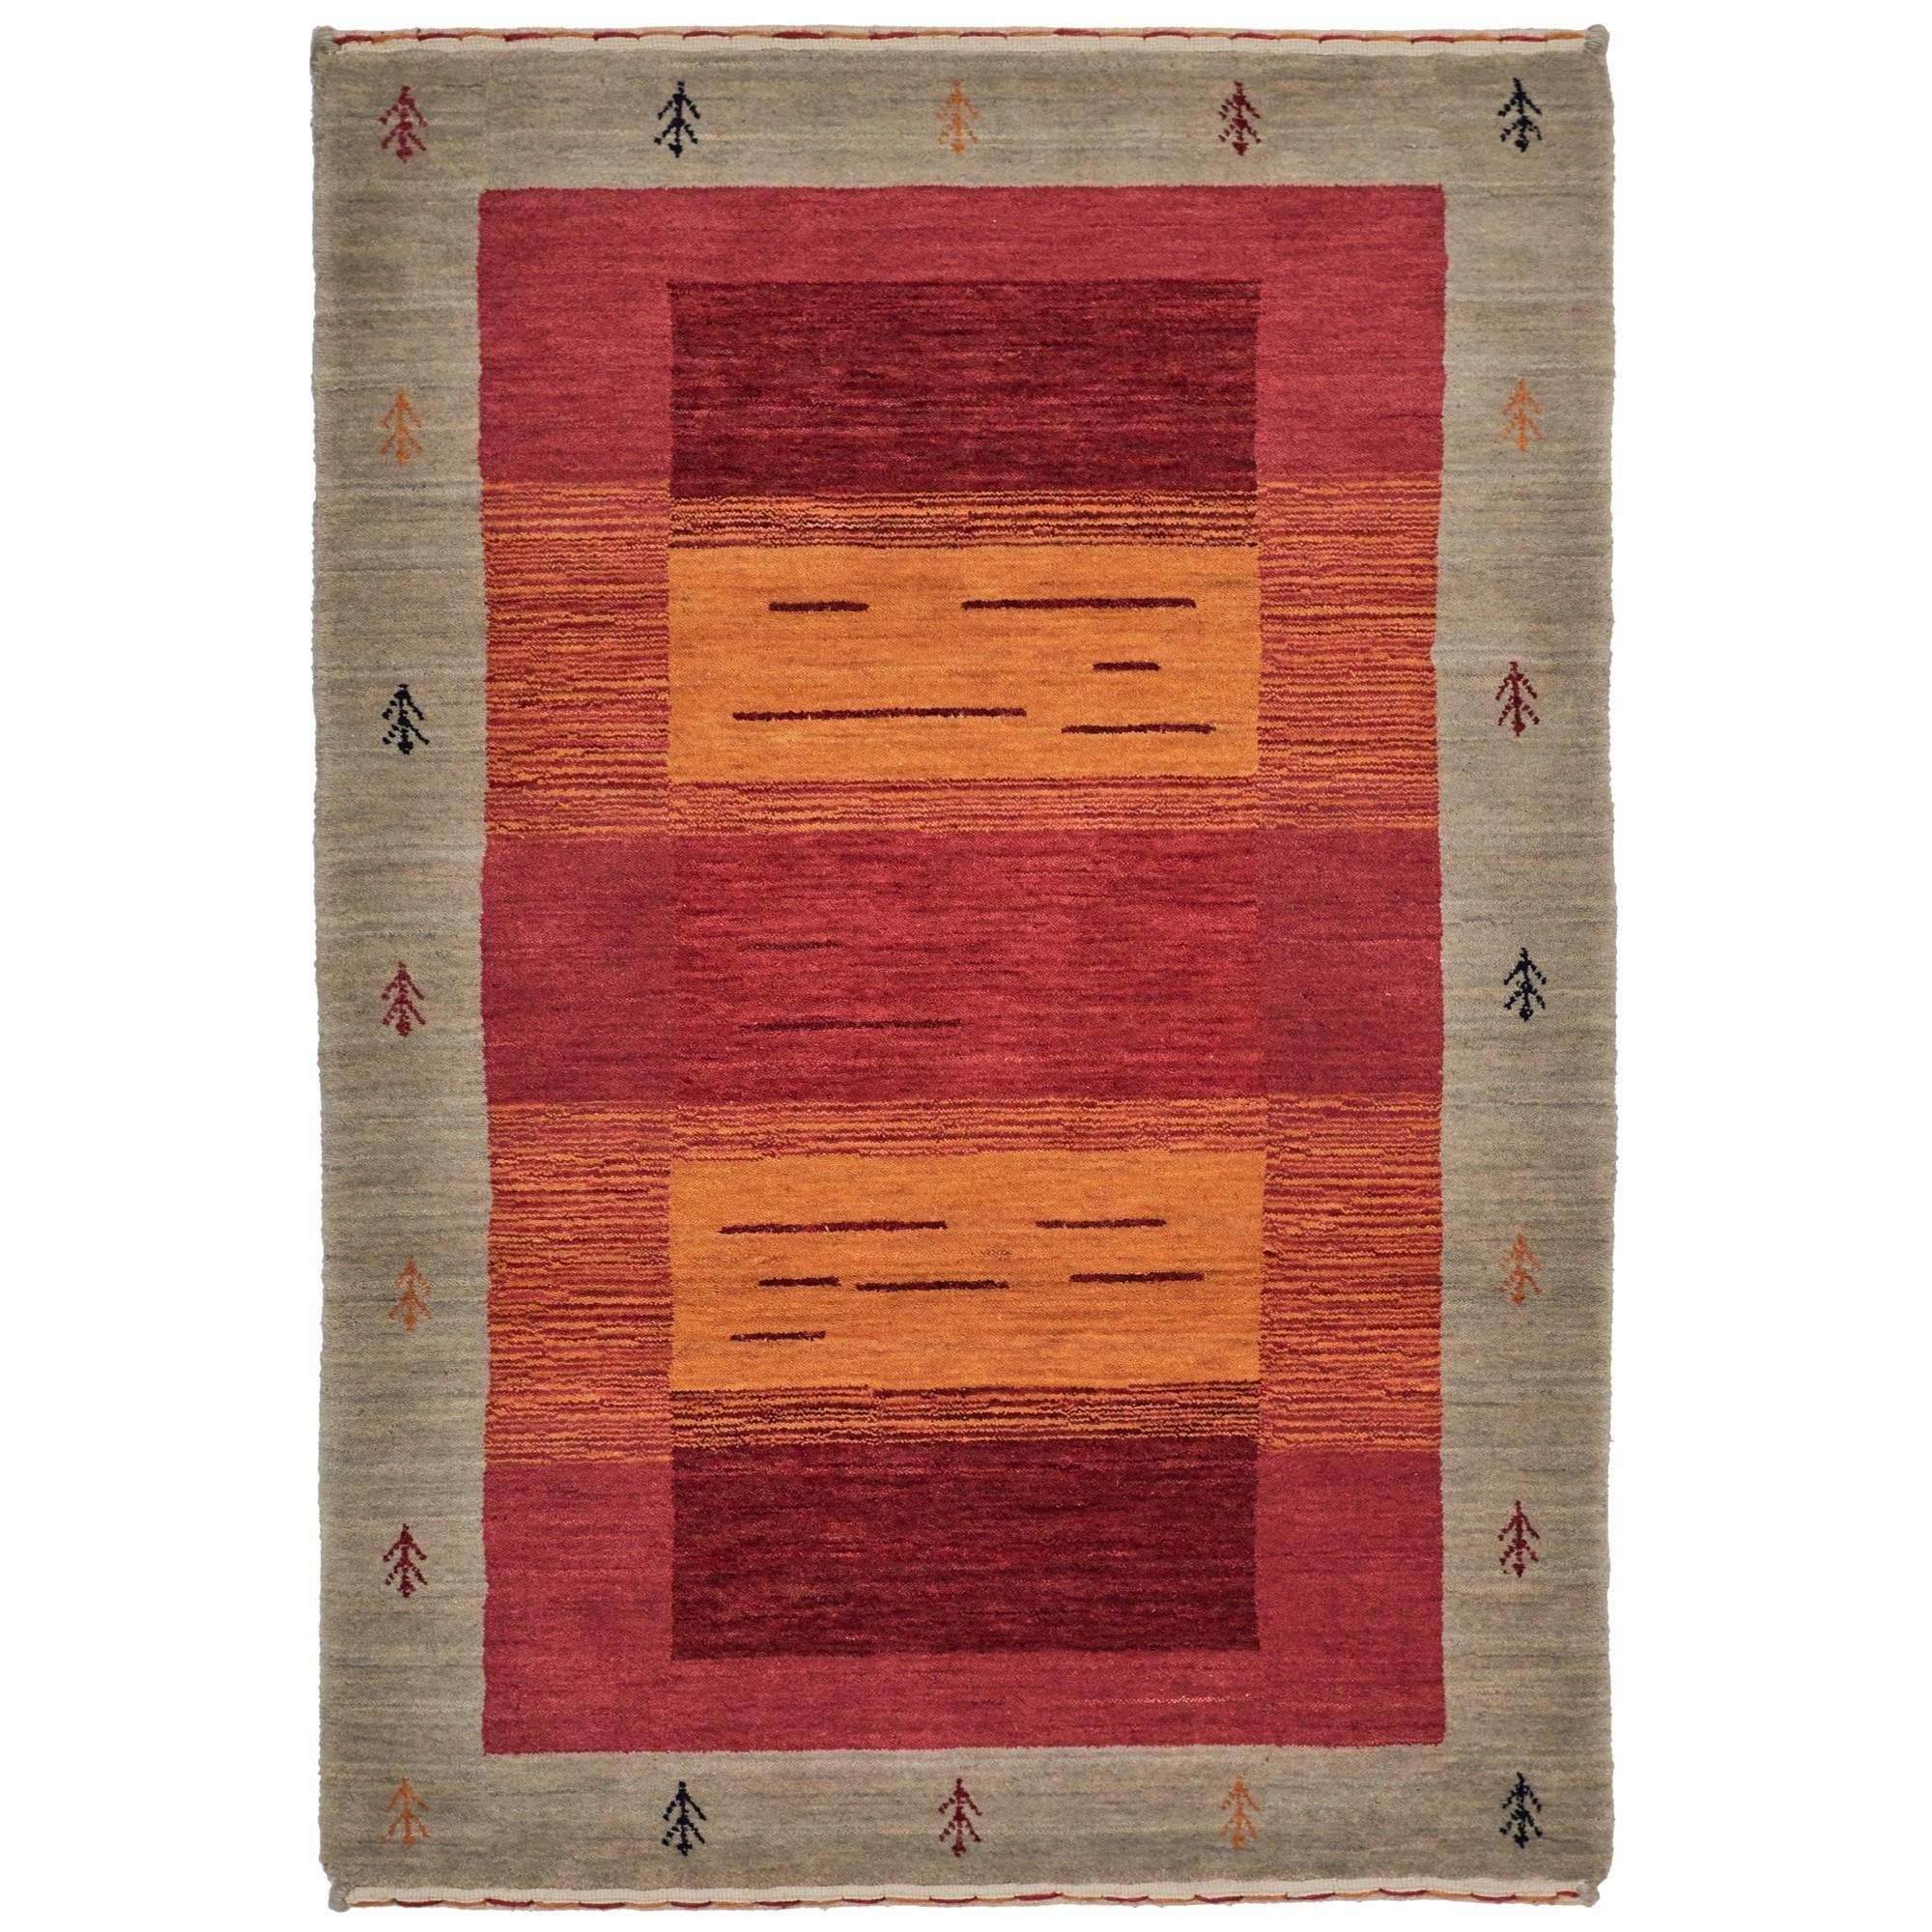 Lori No.202 Wool Tribal Rug, 225x155cm, Red / Brown